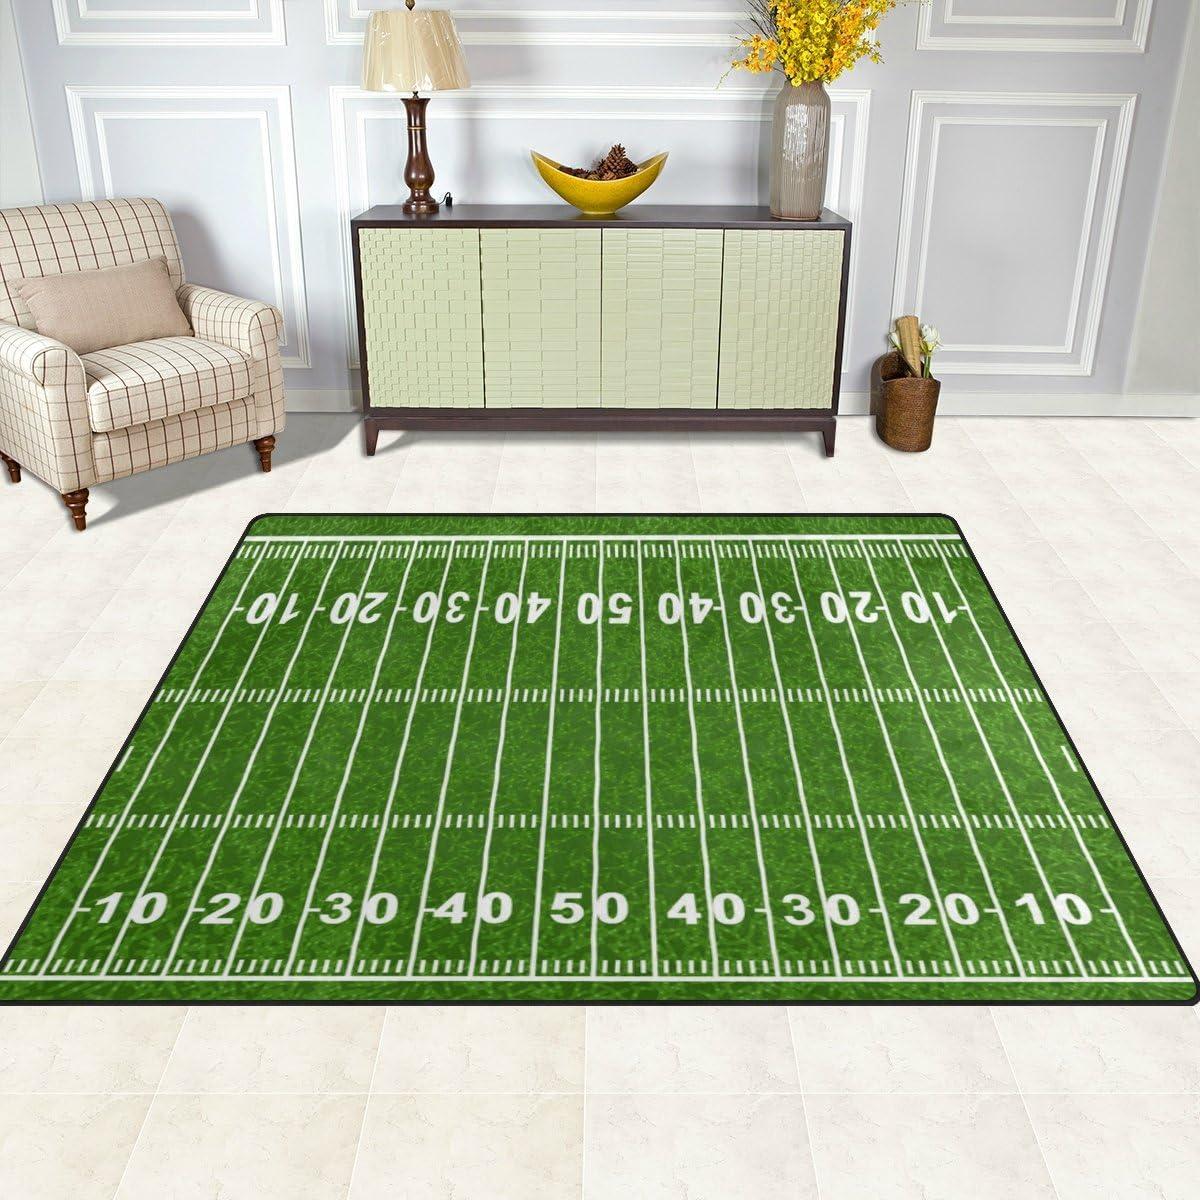 Cooper Girl American Football Field Kids Area Rug Learning Carpet